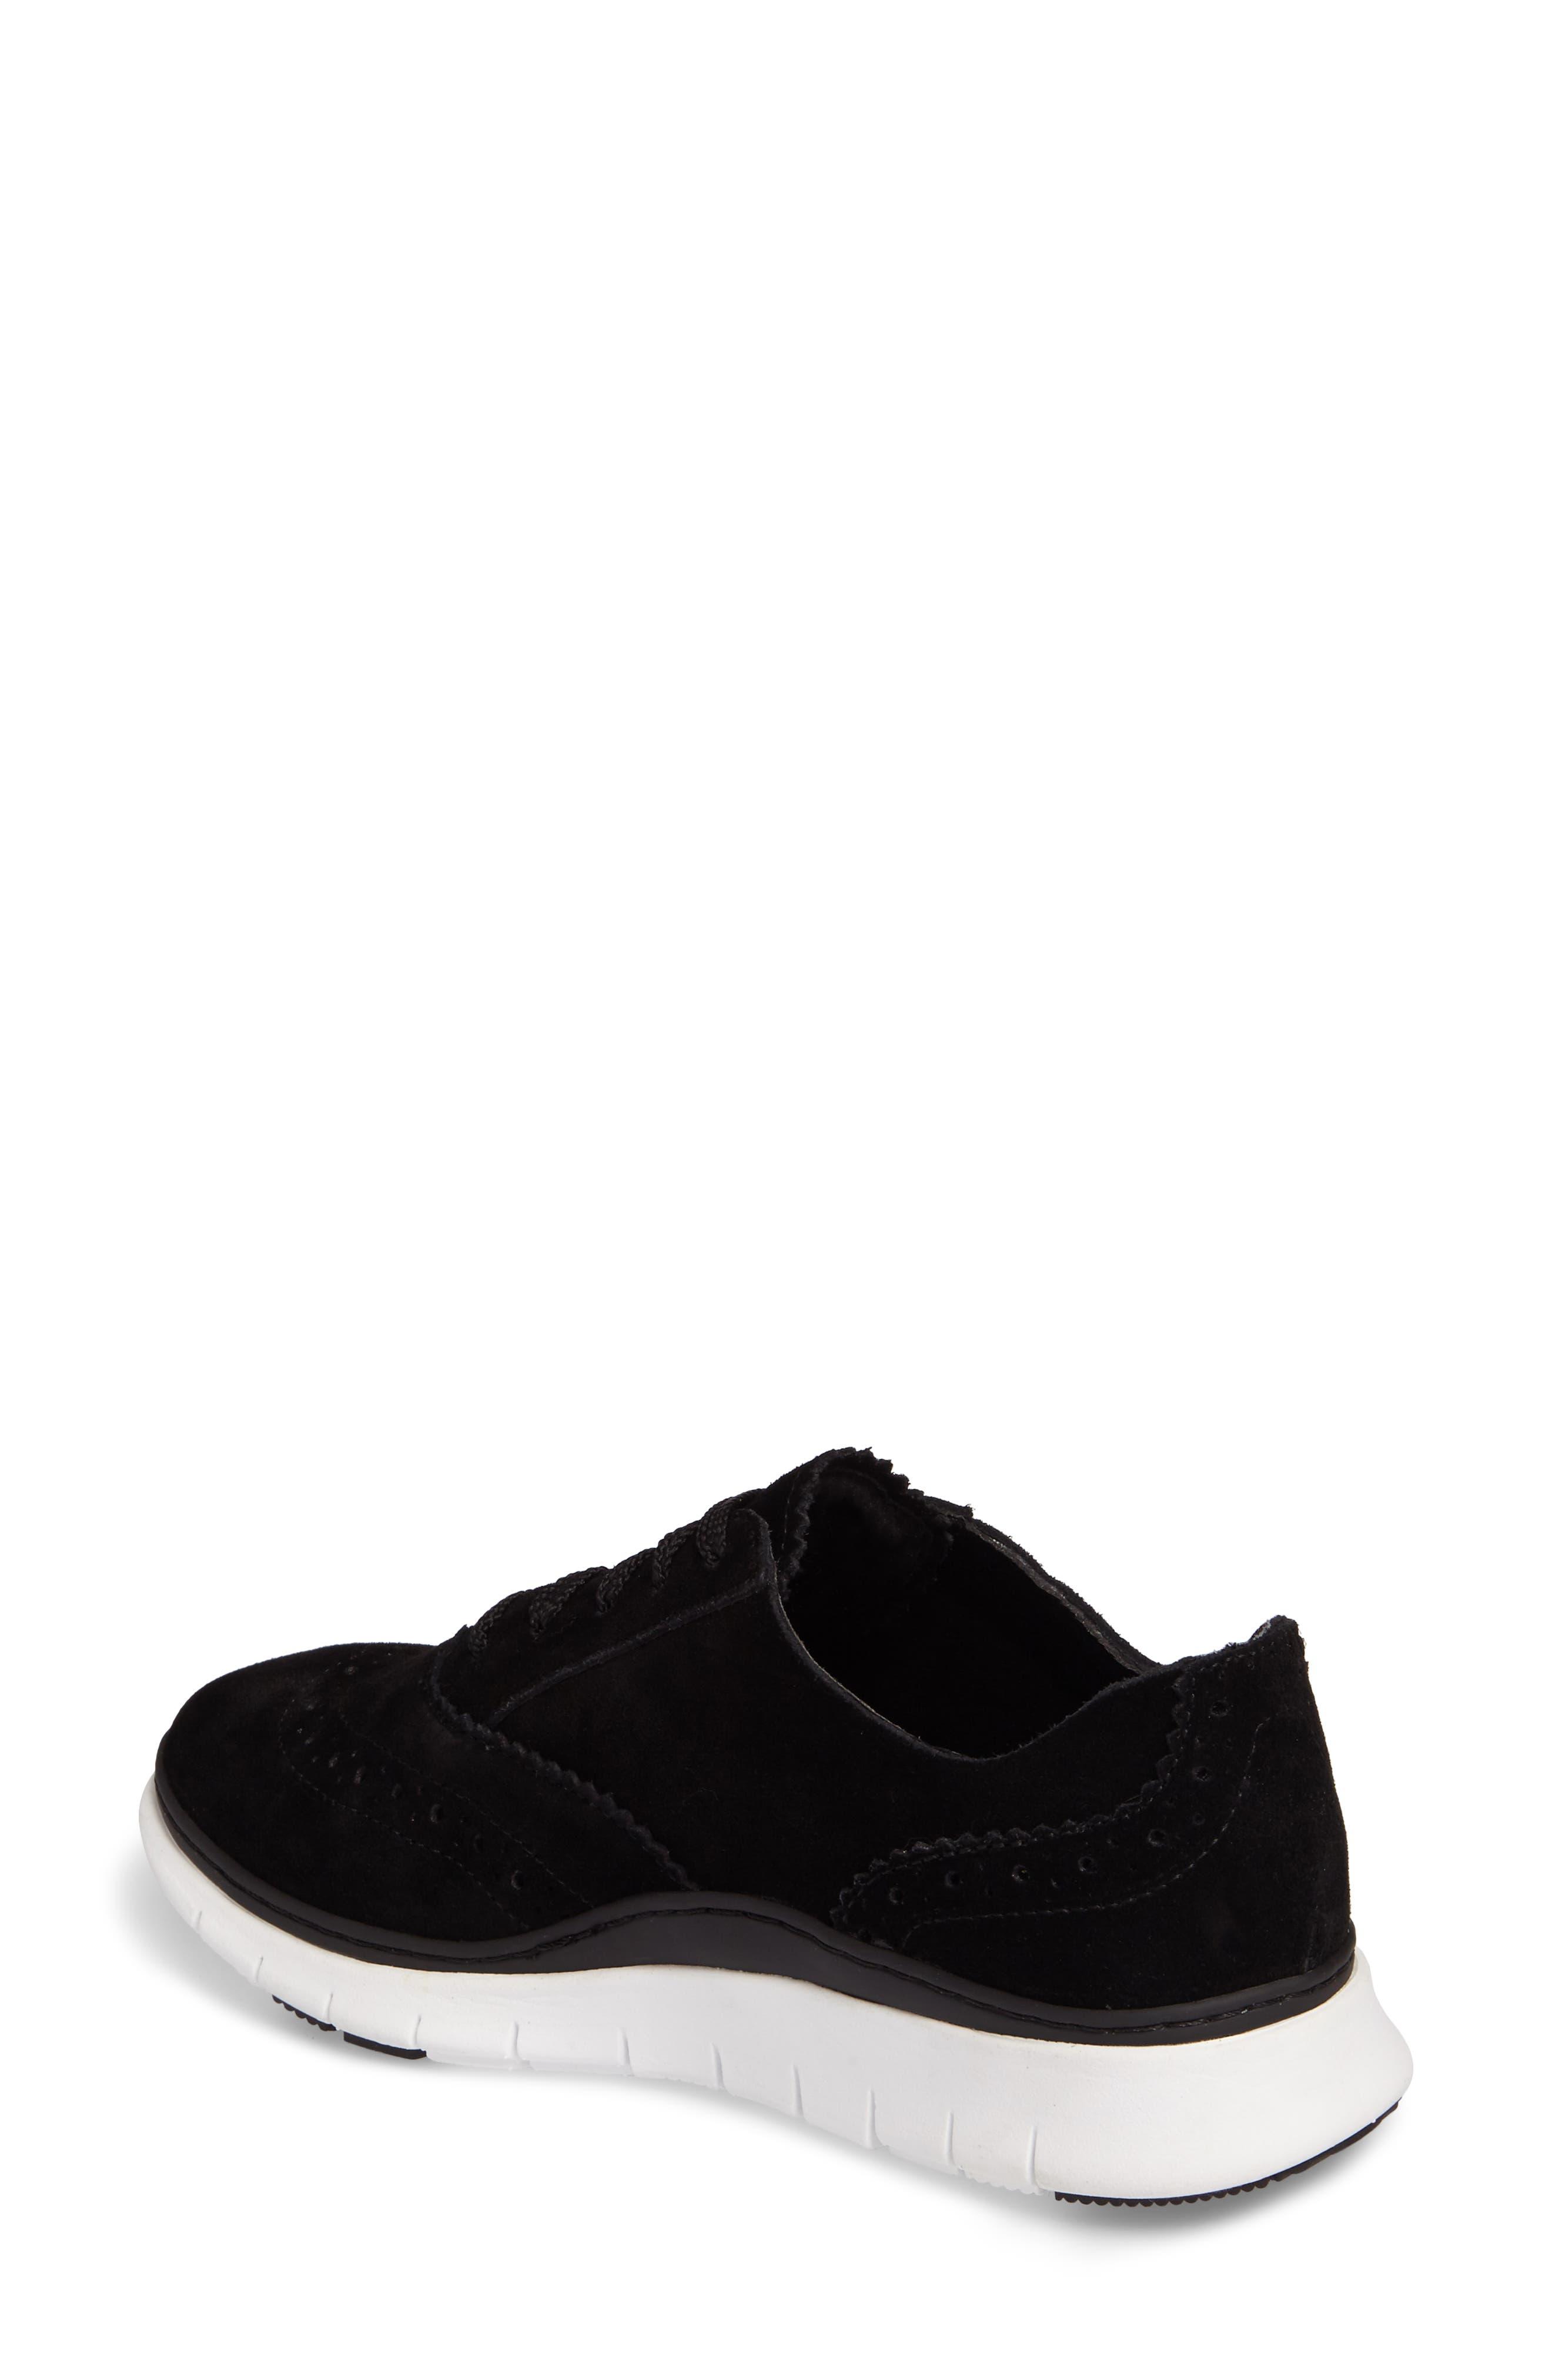 Kenley Sneaker,                             Alternate thumbnail 2, color,                             Black Suede